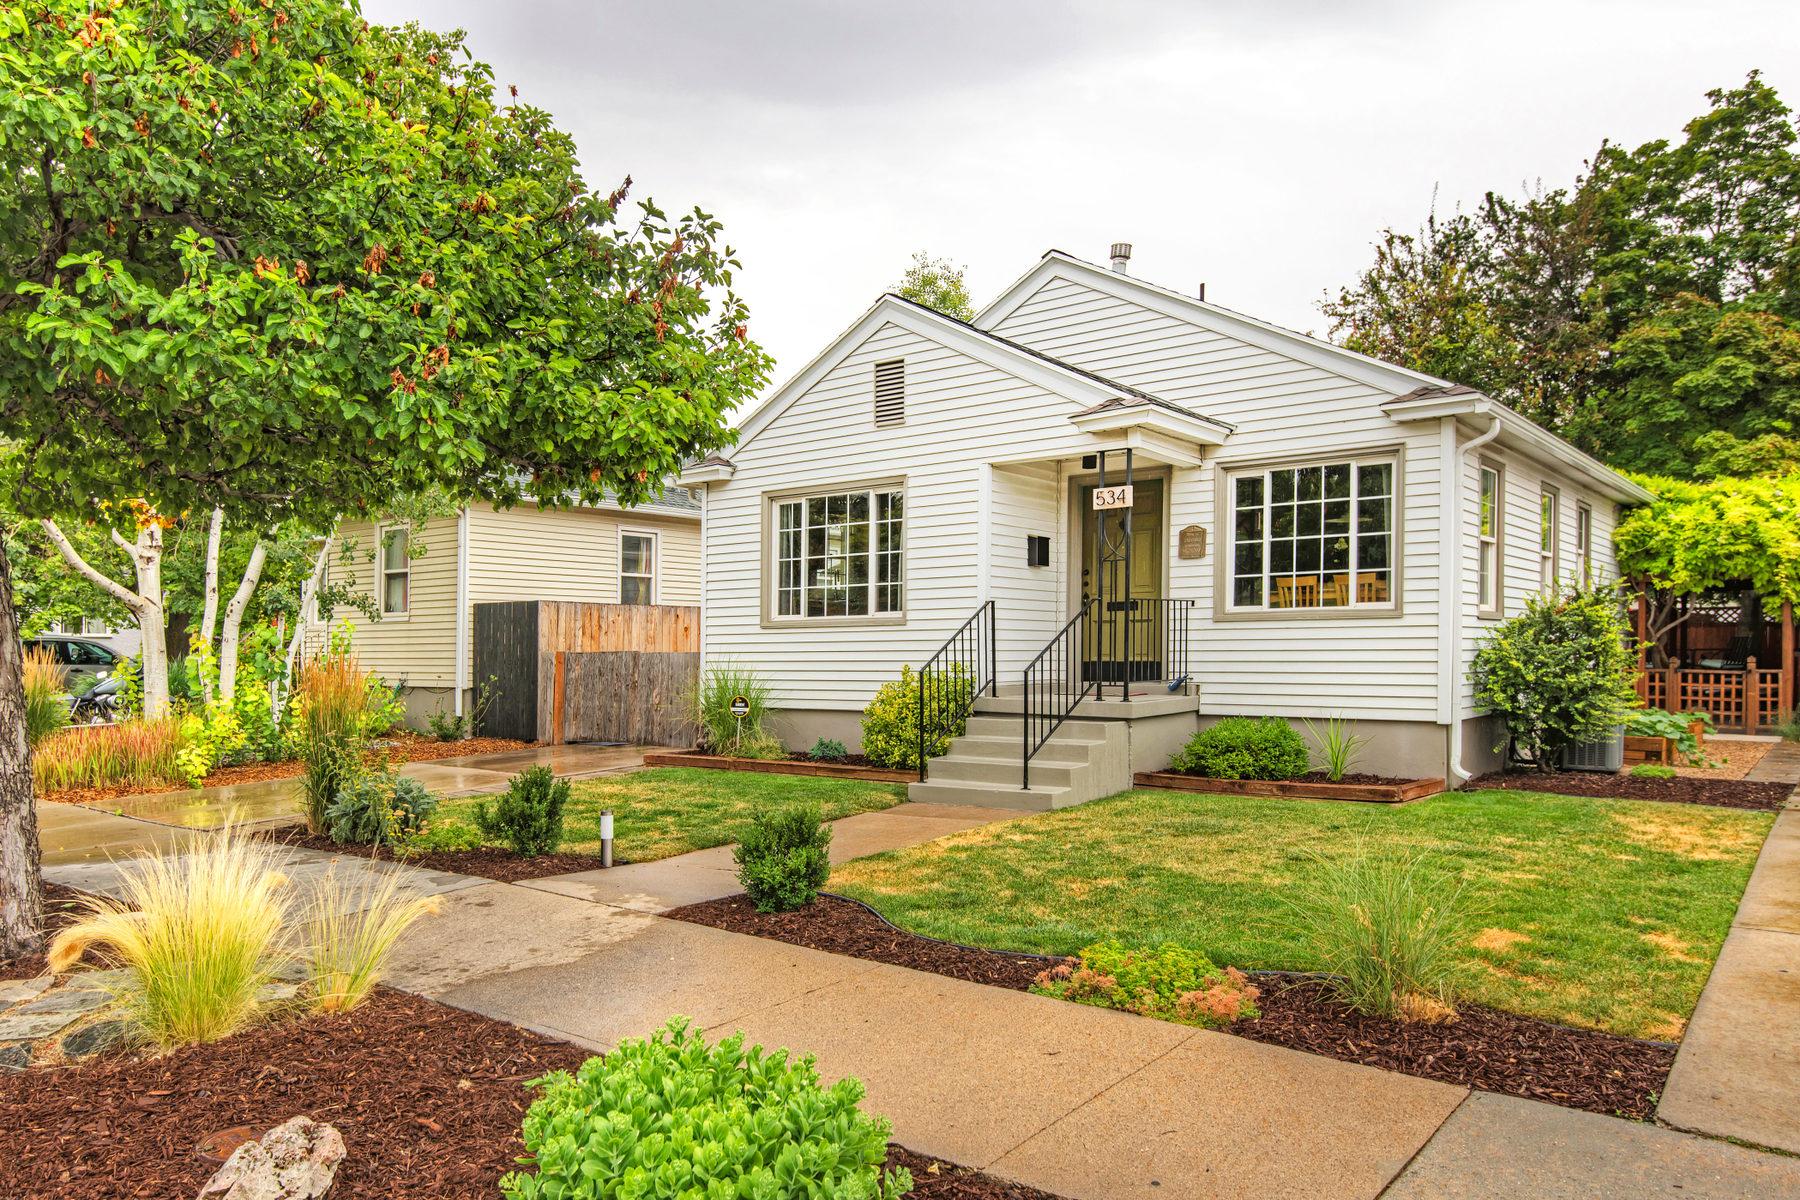 Single Family Home for Sale at Liberty Park Tranquility 534 Downington Ave Salt Lake City, Utah 84105 United States